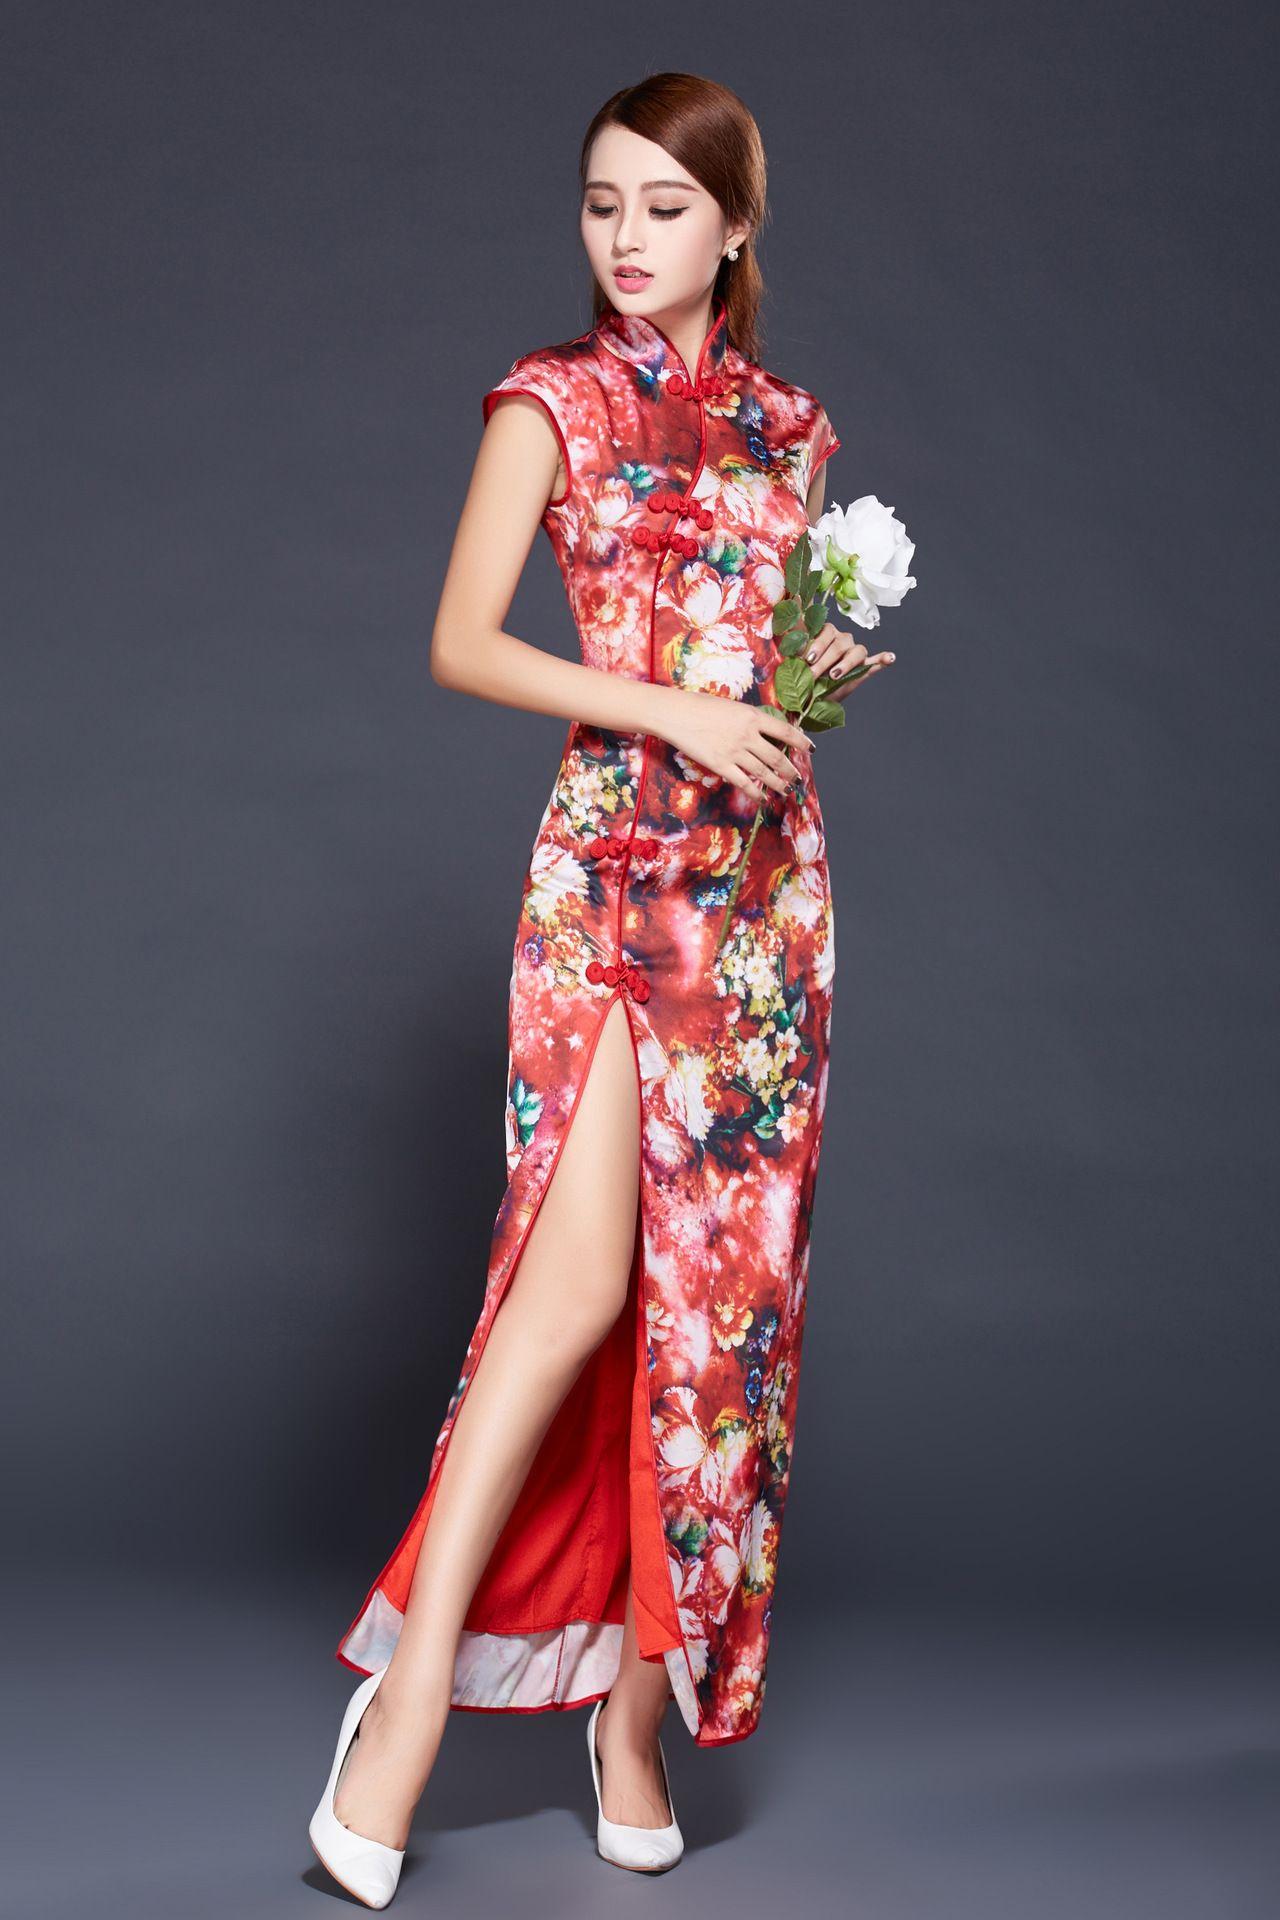 214f7d462e0e6 チャイナドレスロングスリット 韓流 タイトウエストチャイナ服 民族風 刺繍チャイナドレス --九六商圏 - 海外ファッション激安通販サイト